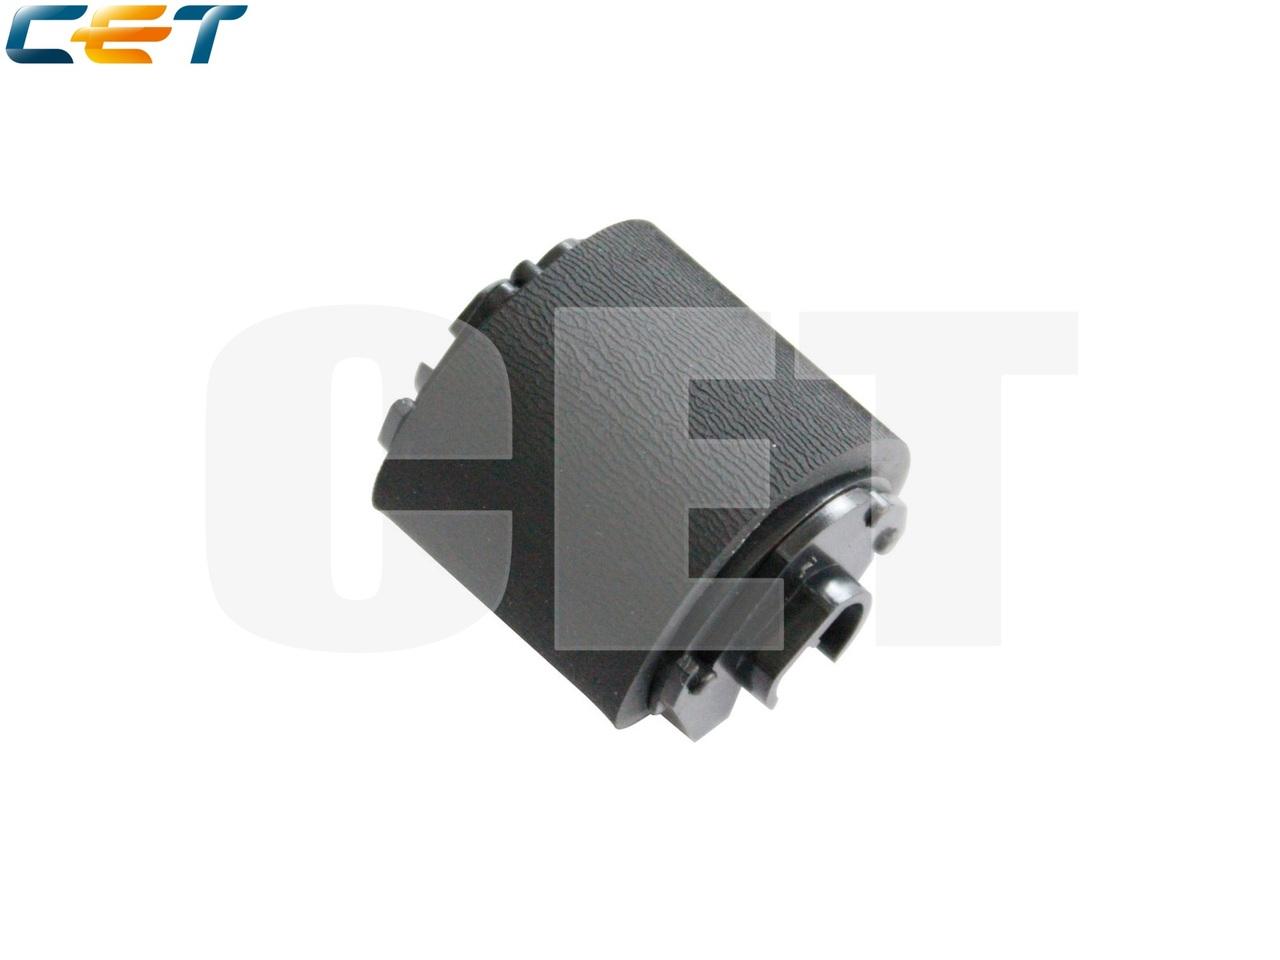 Ролик подхвата JC73-00239A для XEROX Phaser 3200MFP(CET), CET6745